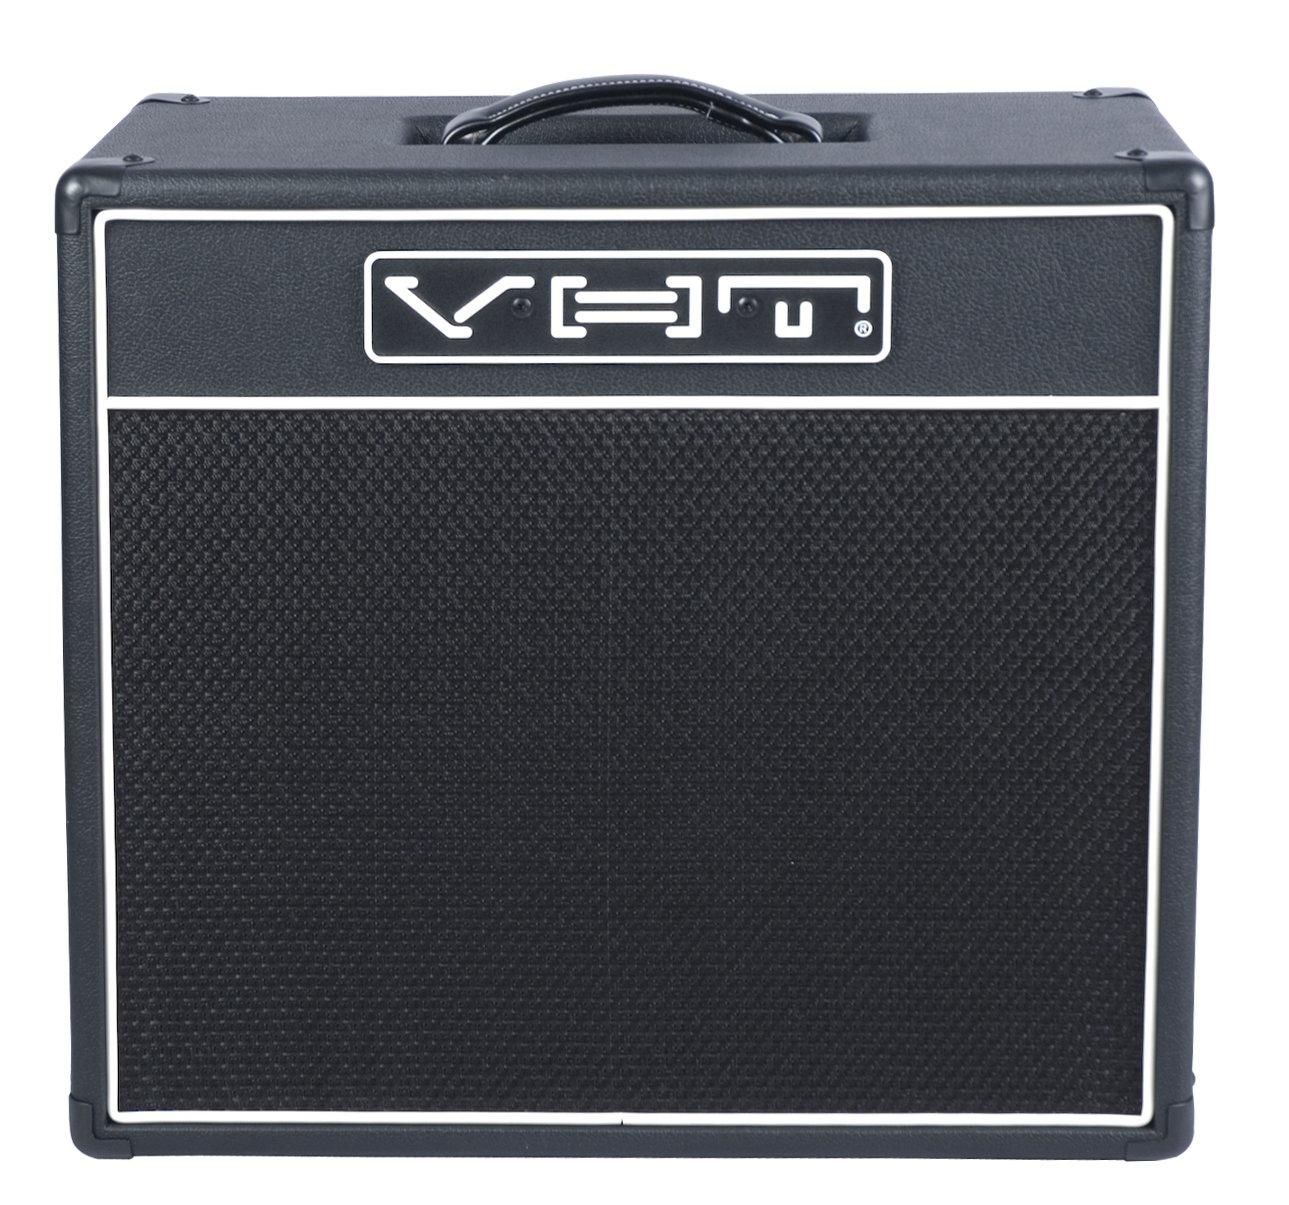 1x12 Guitar Cabinet Empty Amazoncom Vht Av Sp 112vht Special 6 1x12 Speaker Cabinet Vht